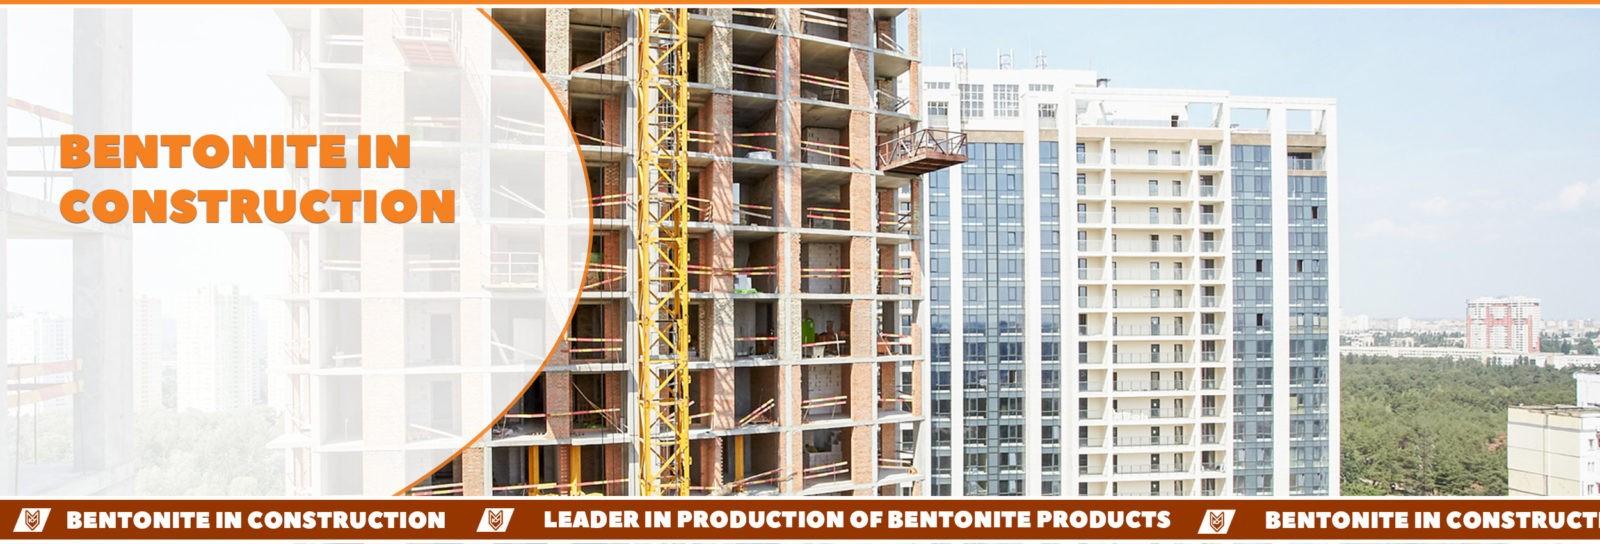 Bentonite in construction